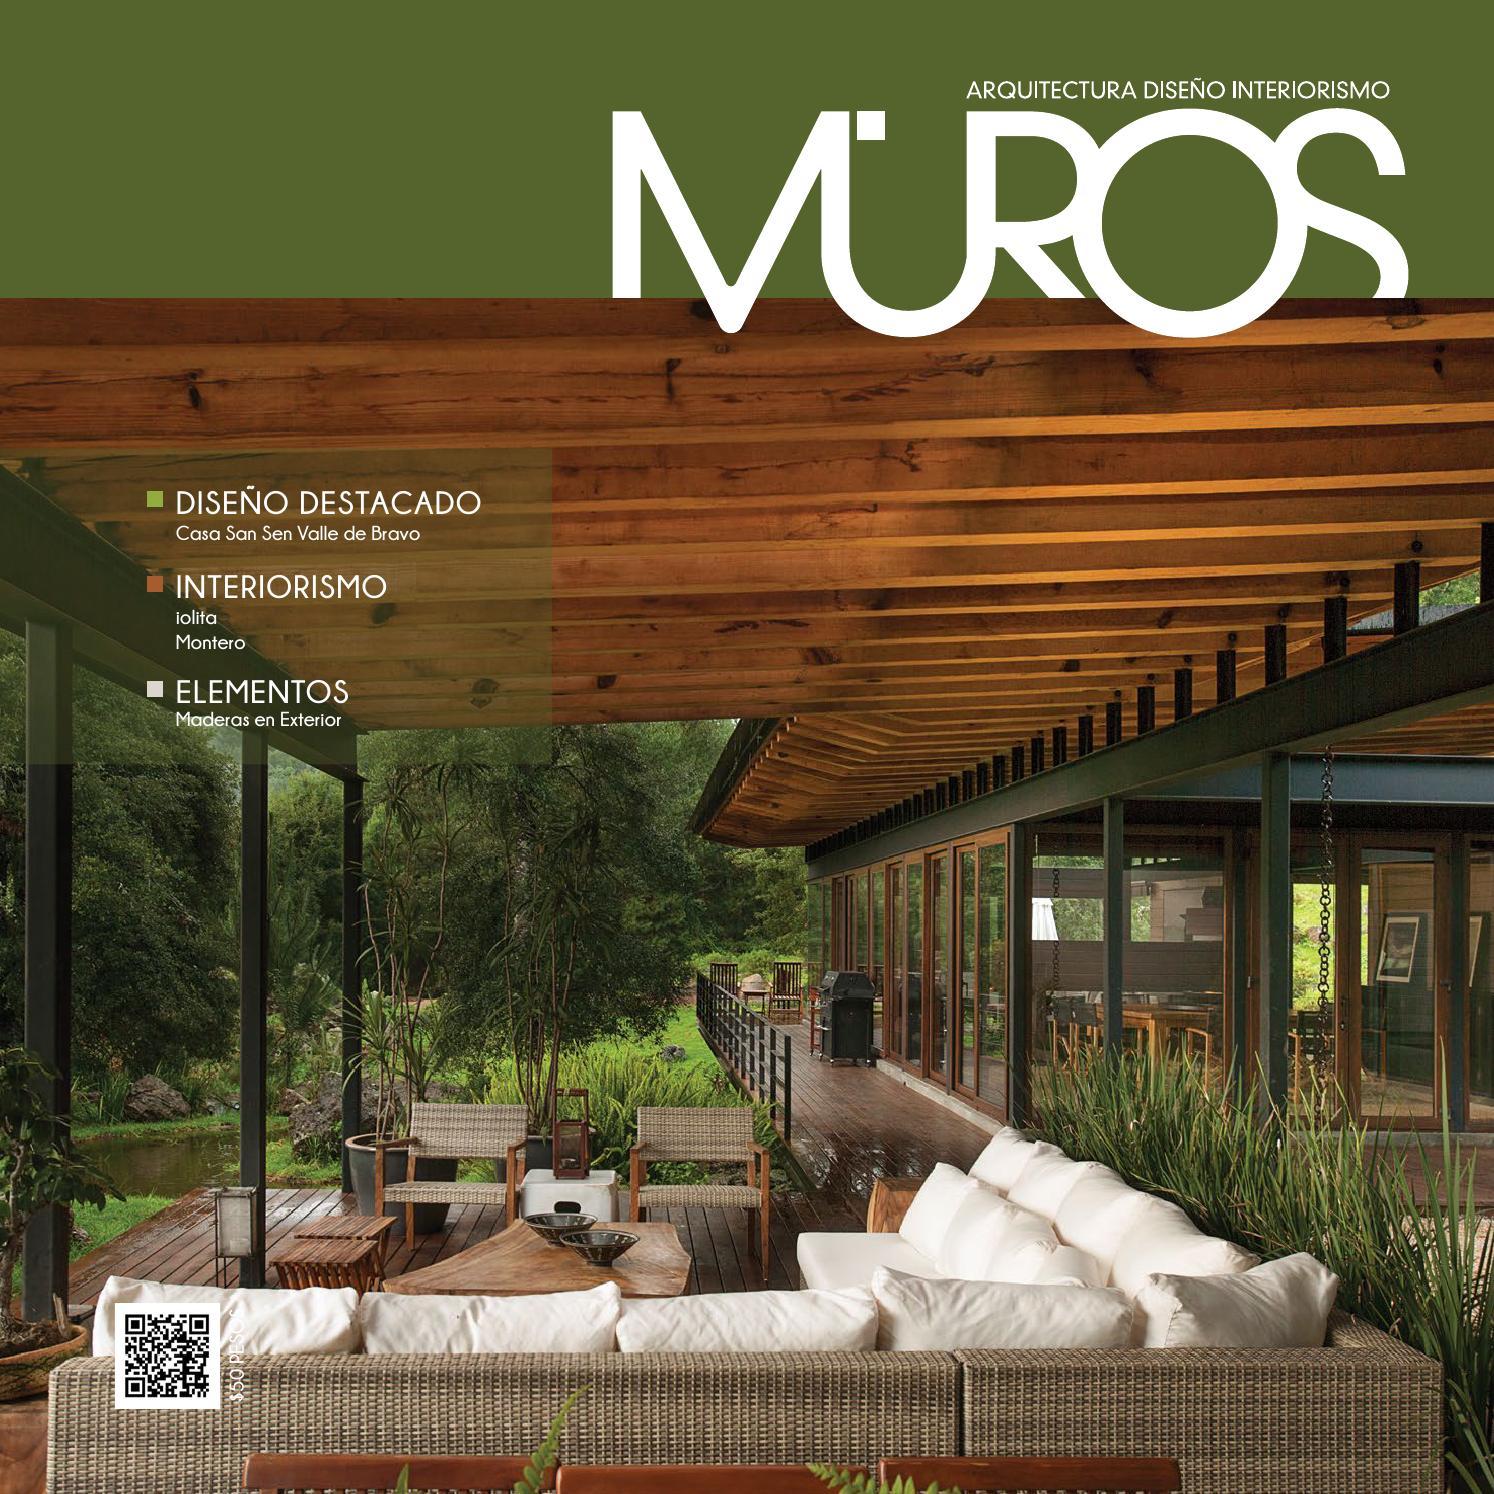 edici n 7 revista muros arquitectura dise o interiorismo